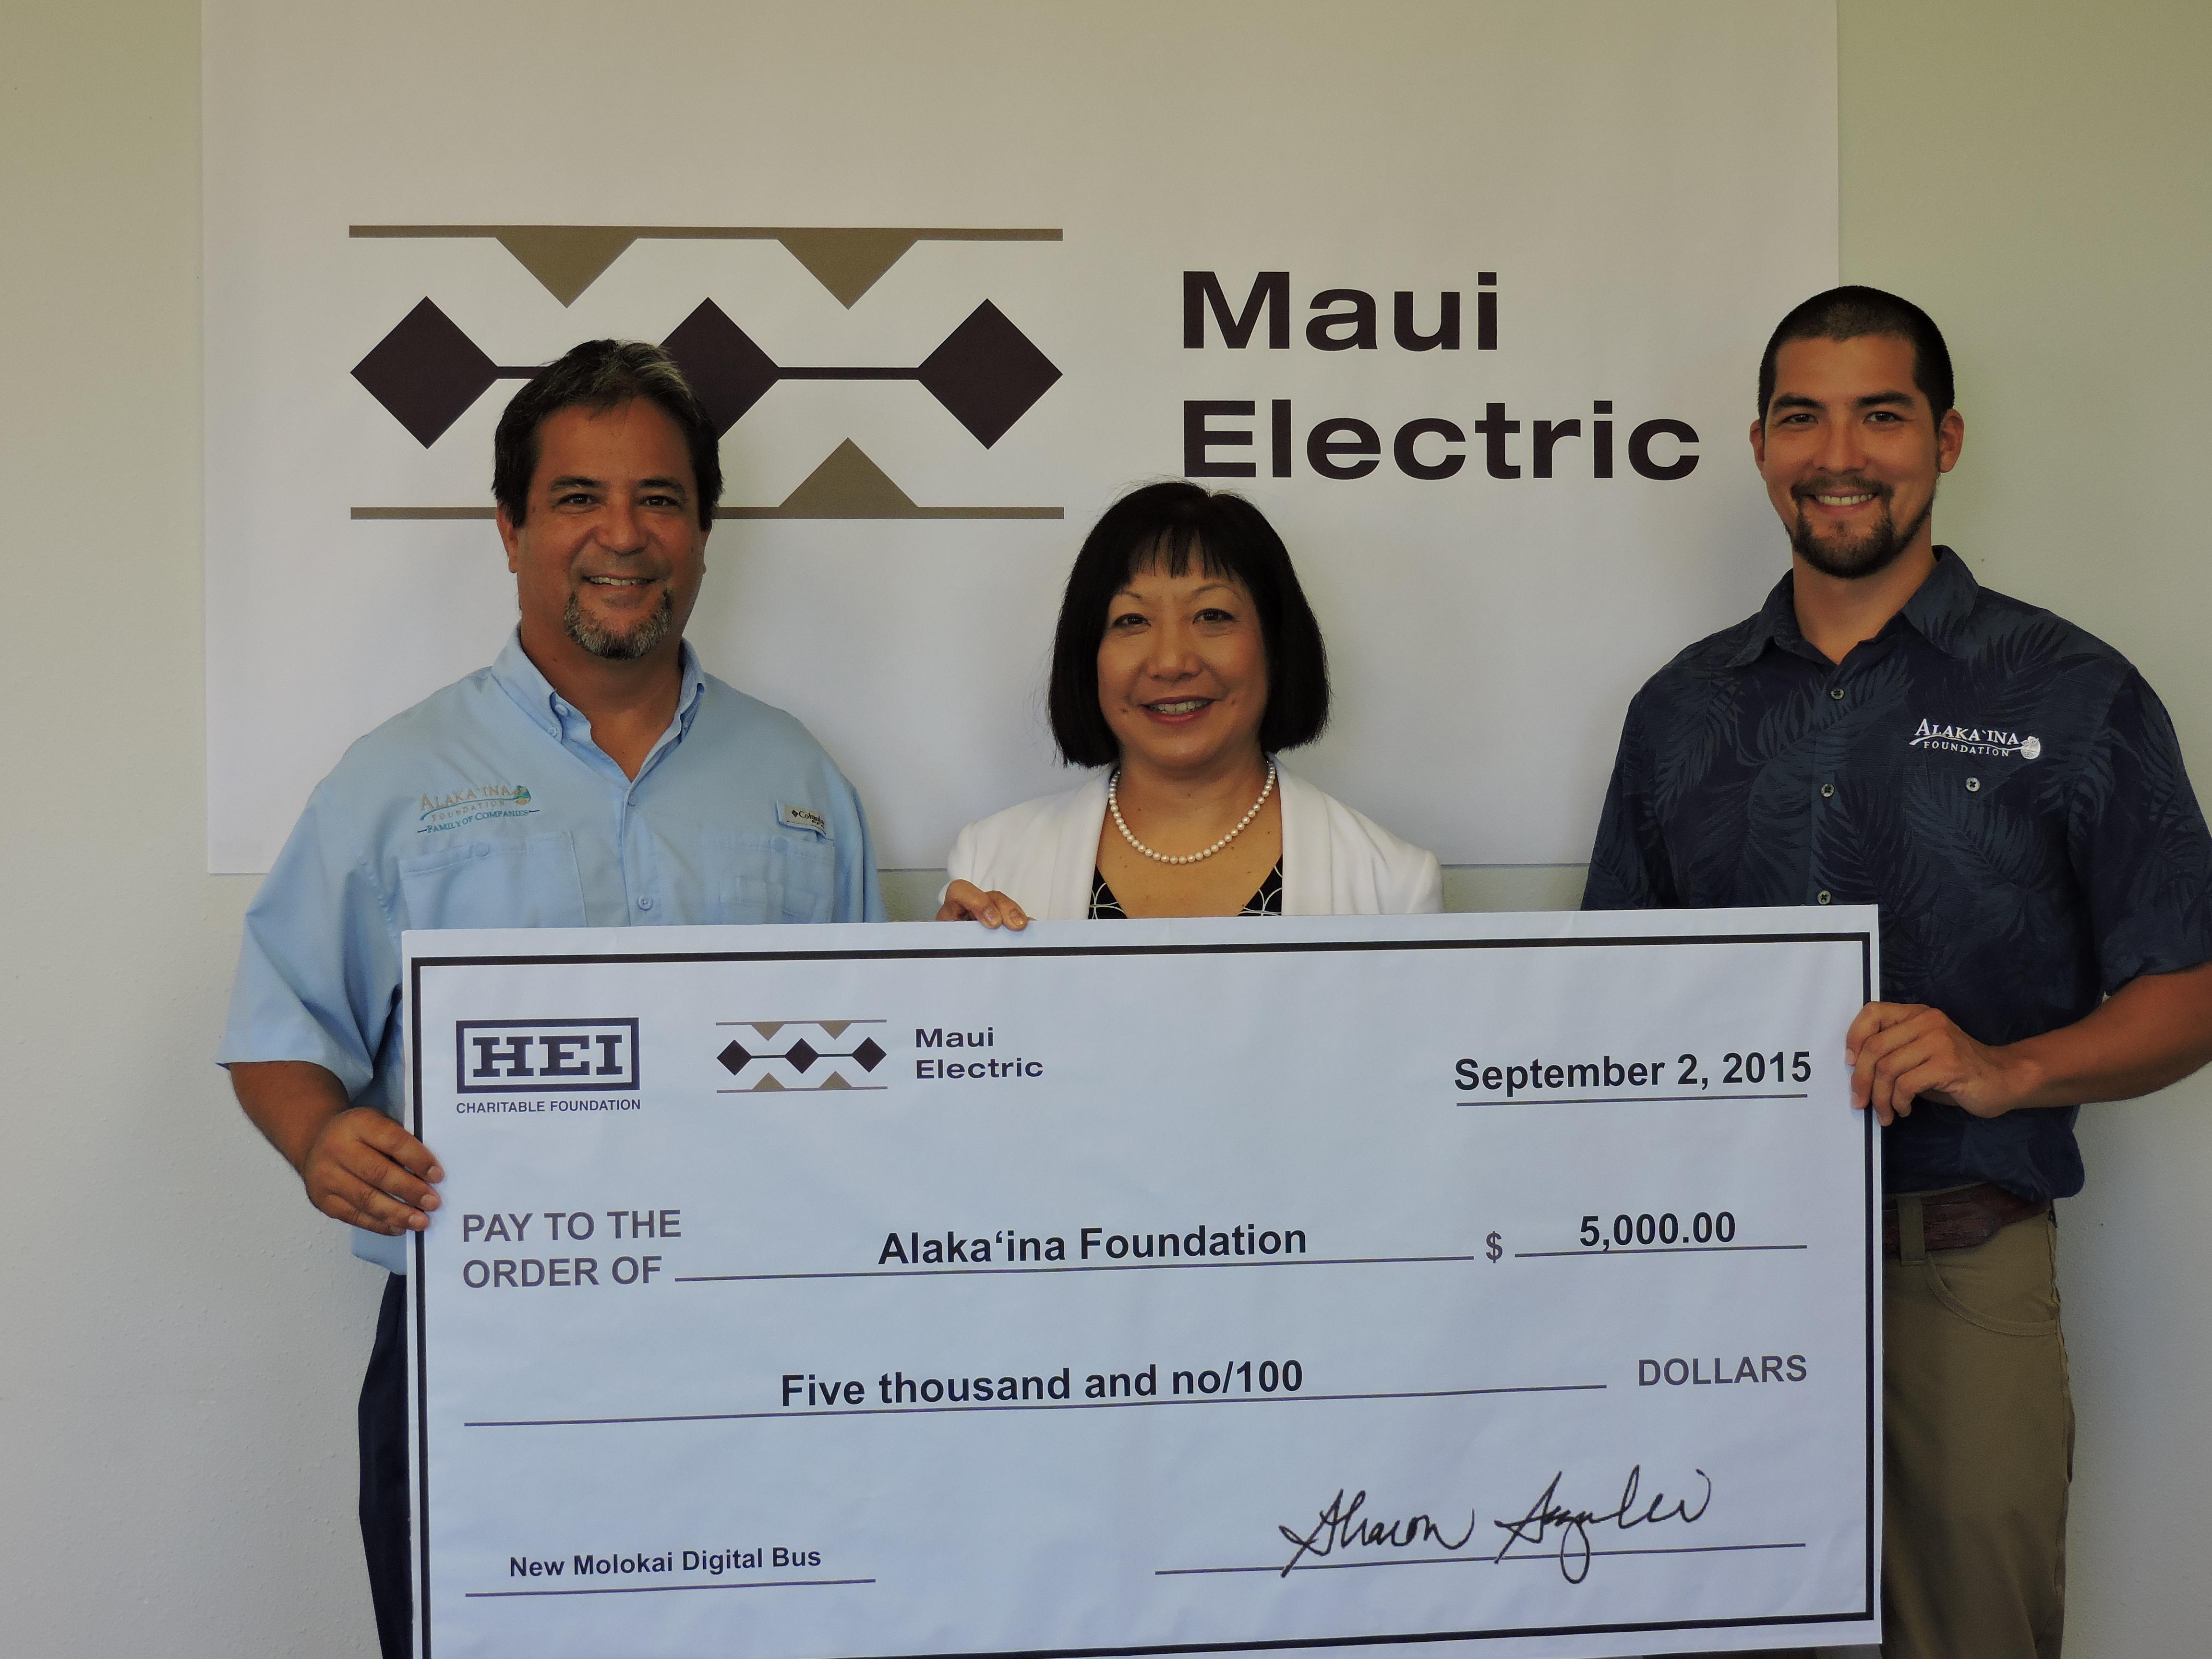 Maui Electric Alaka'ina Foundation Donation